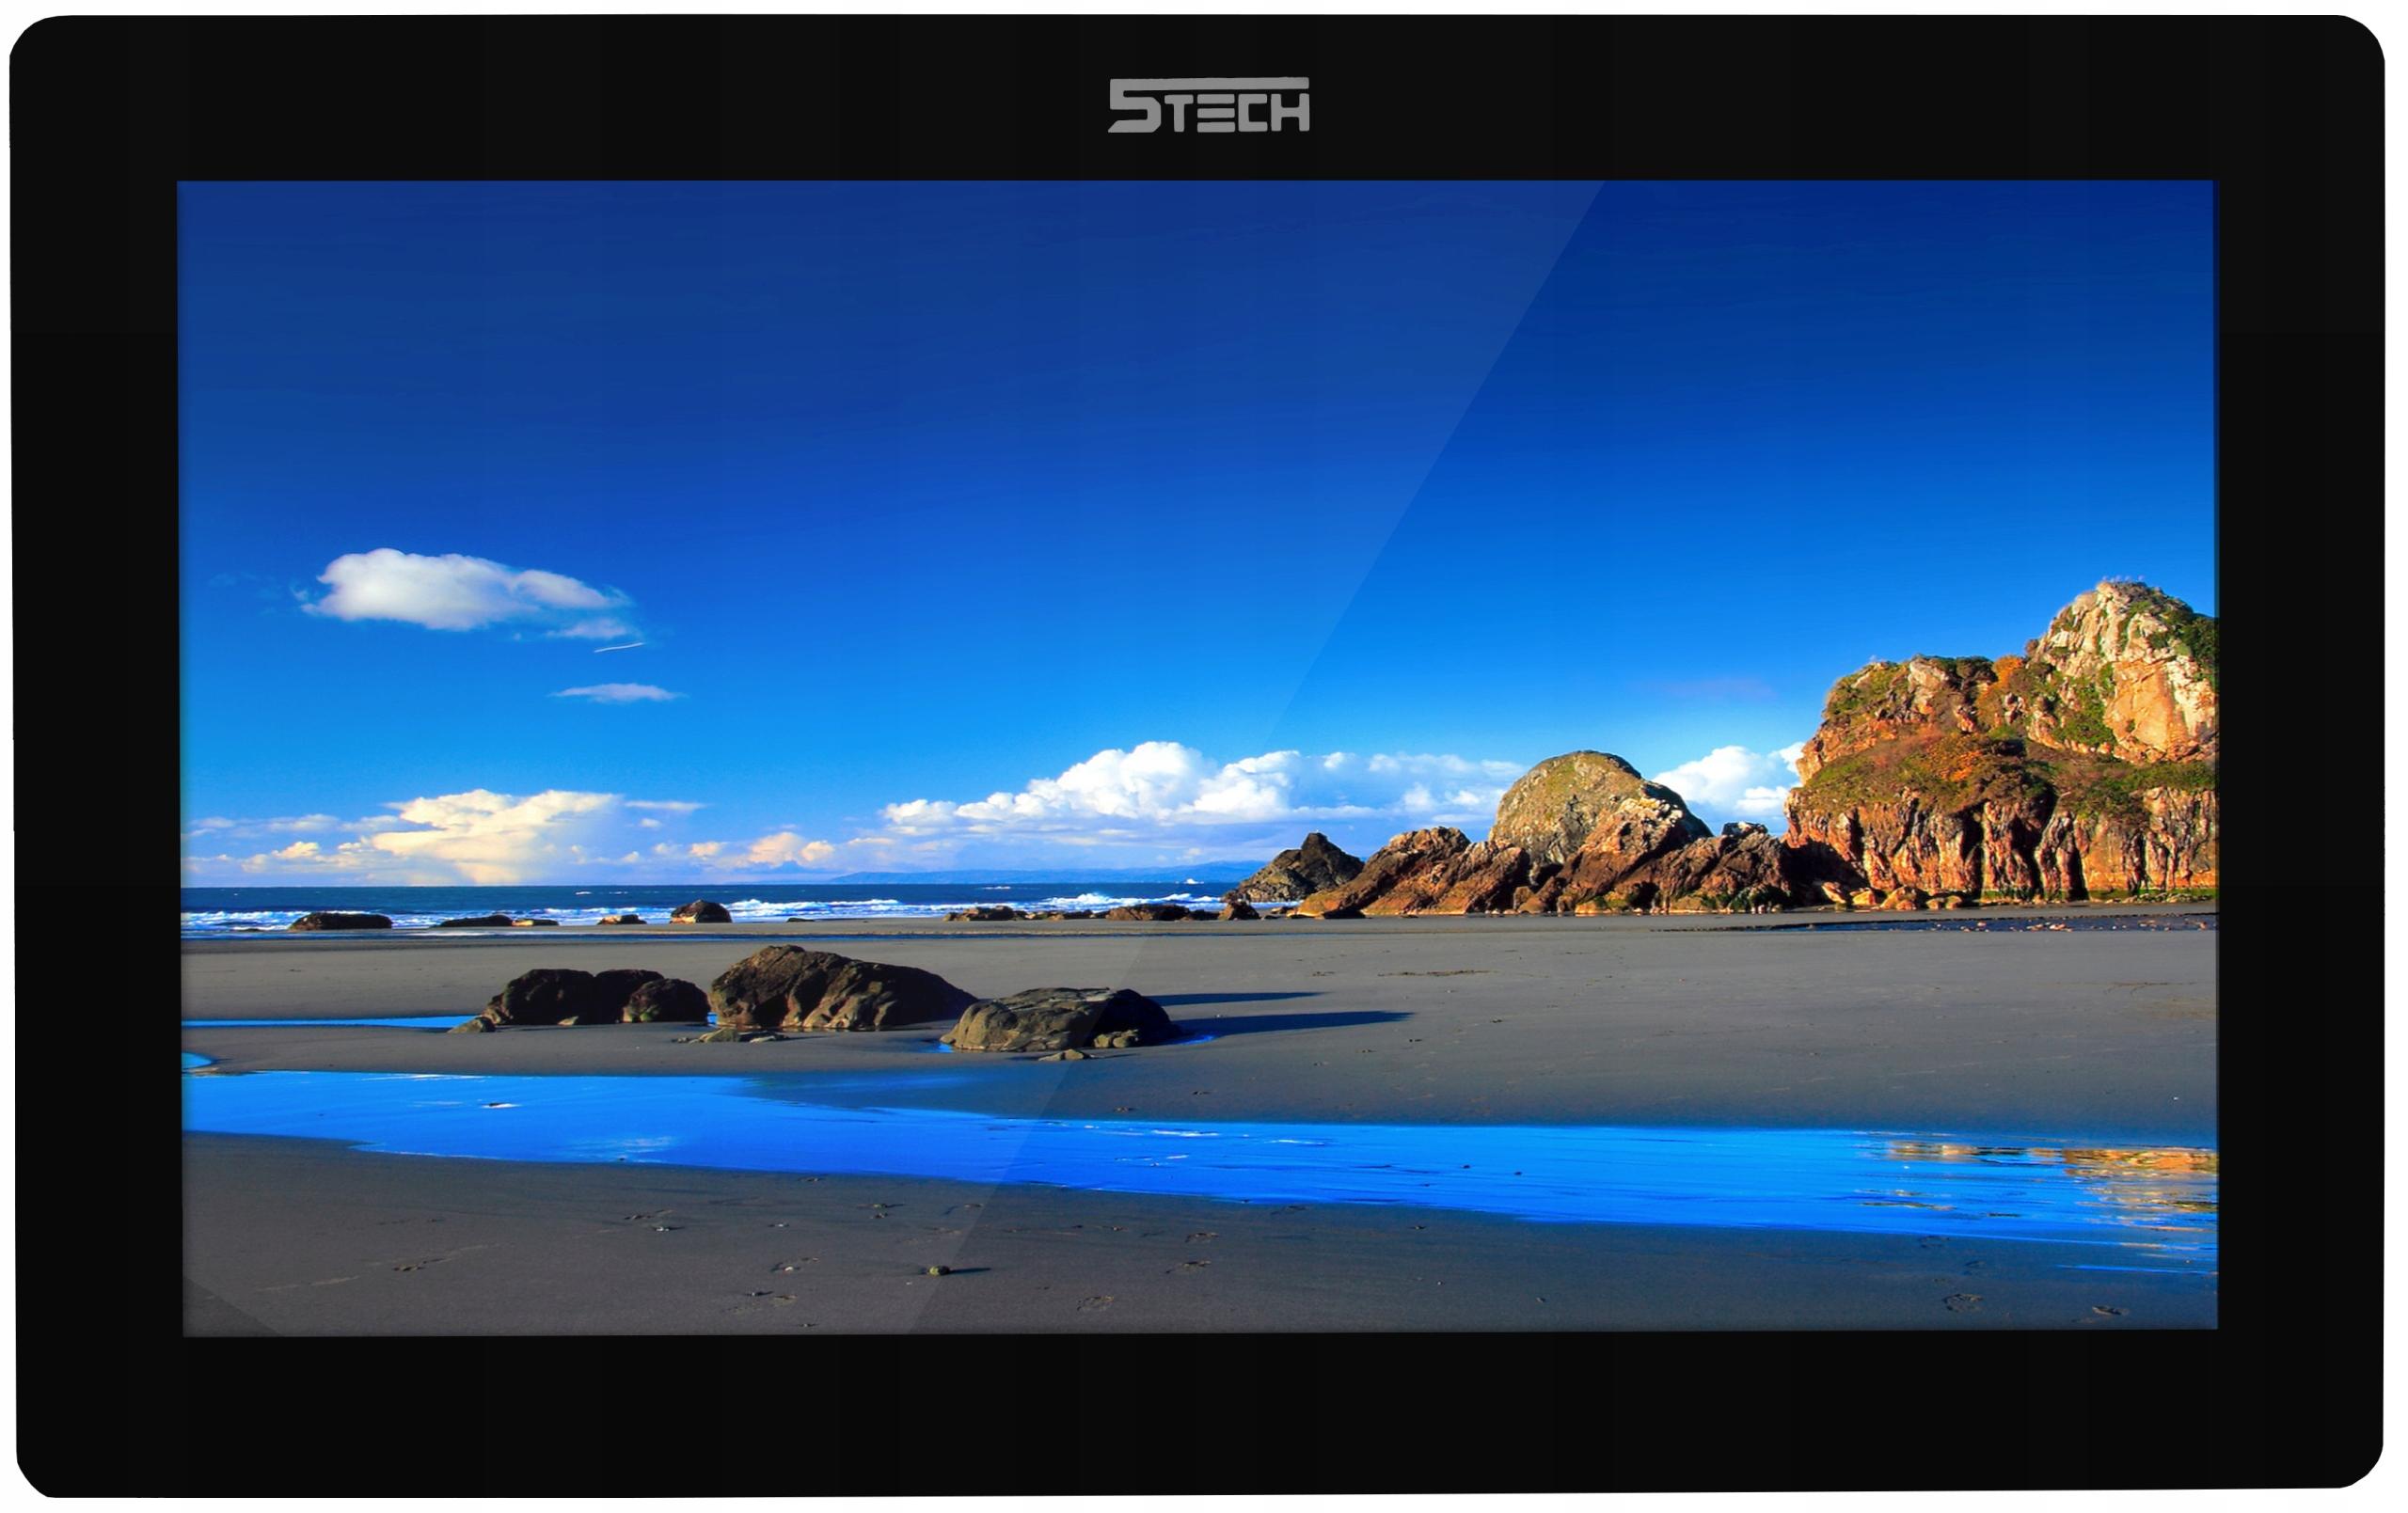 Wideodomofon Videodomofon WiFi FHD 5TECH TELEFON Marka 5Tech